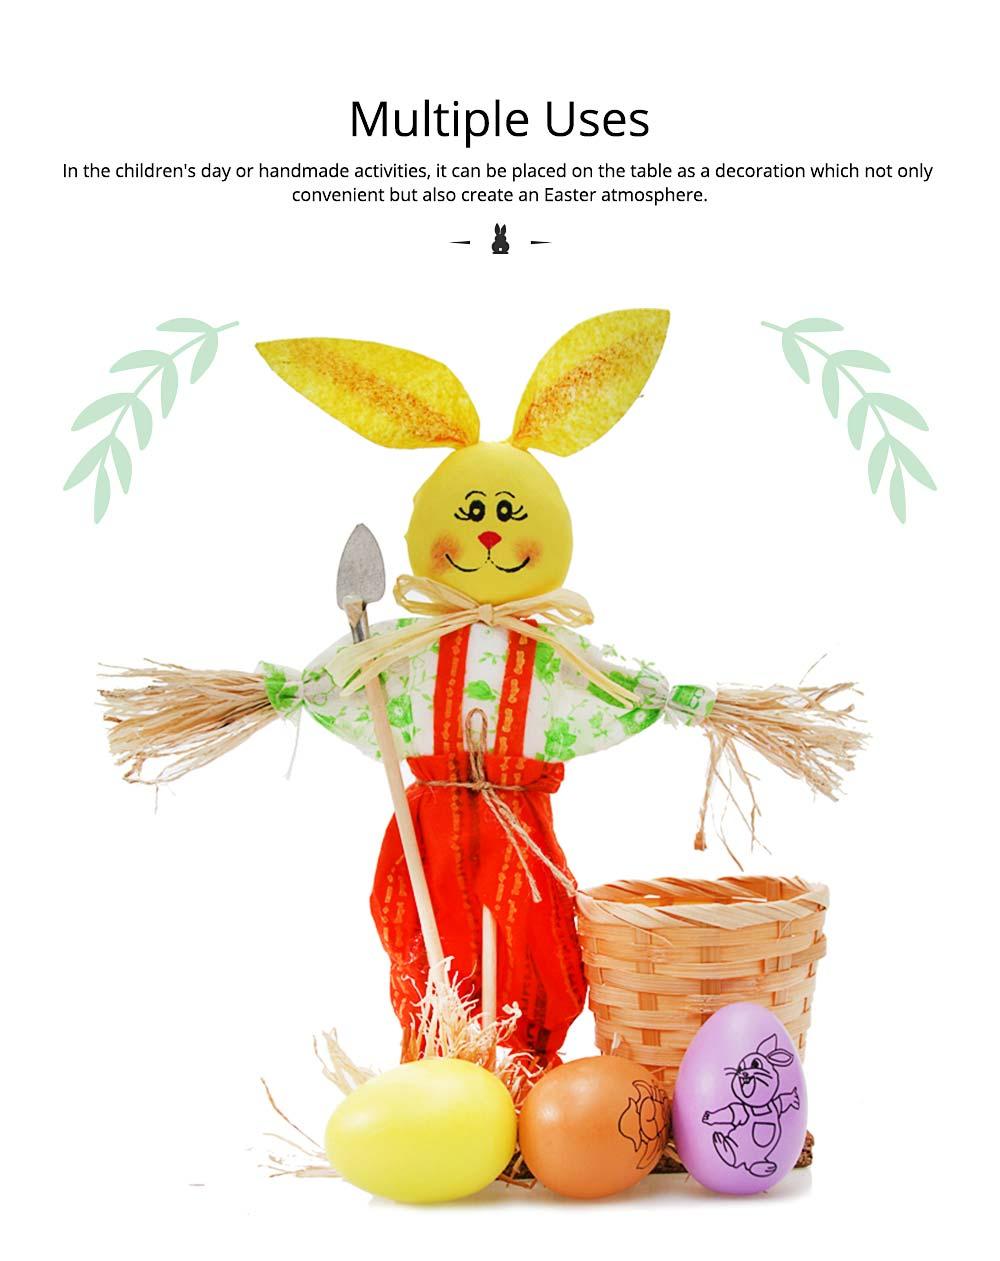 Easter Bunny Decorates as Brush Pot with Cute Rabbit Scarecrow Design, Kindergarten Gift 2